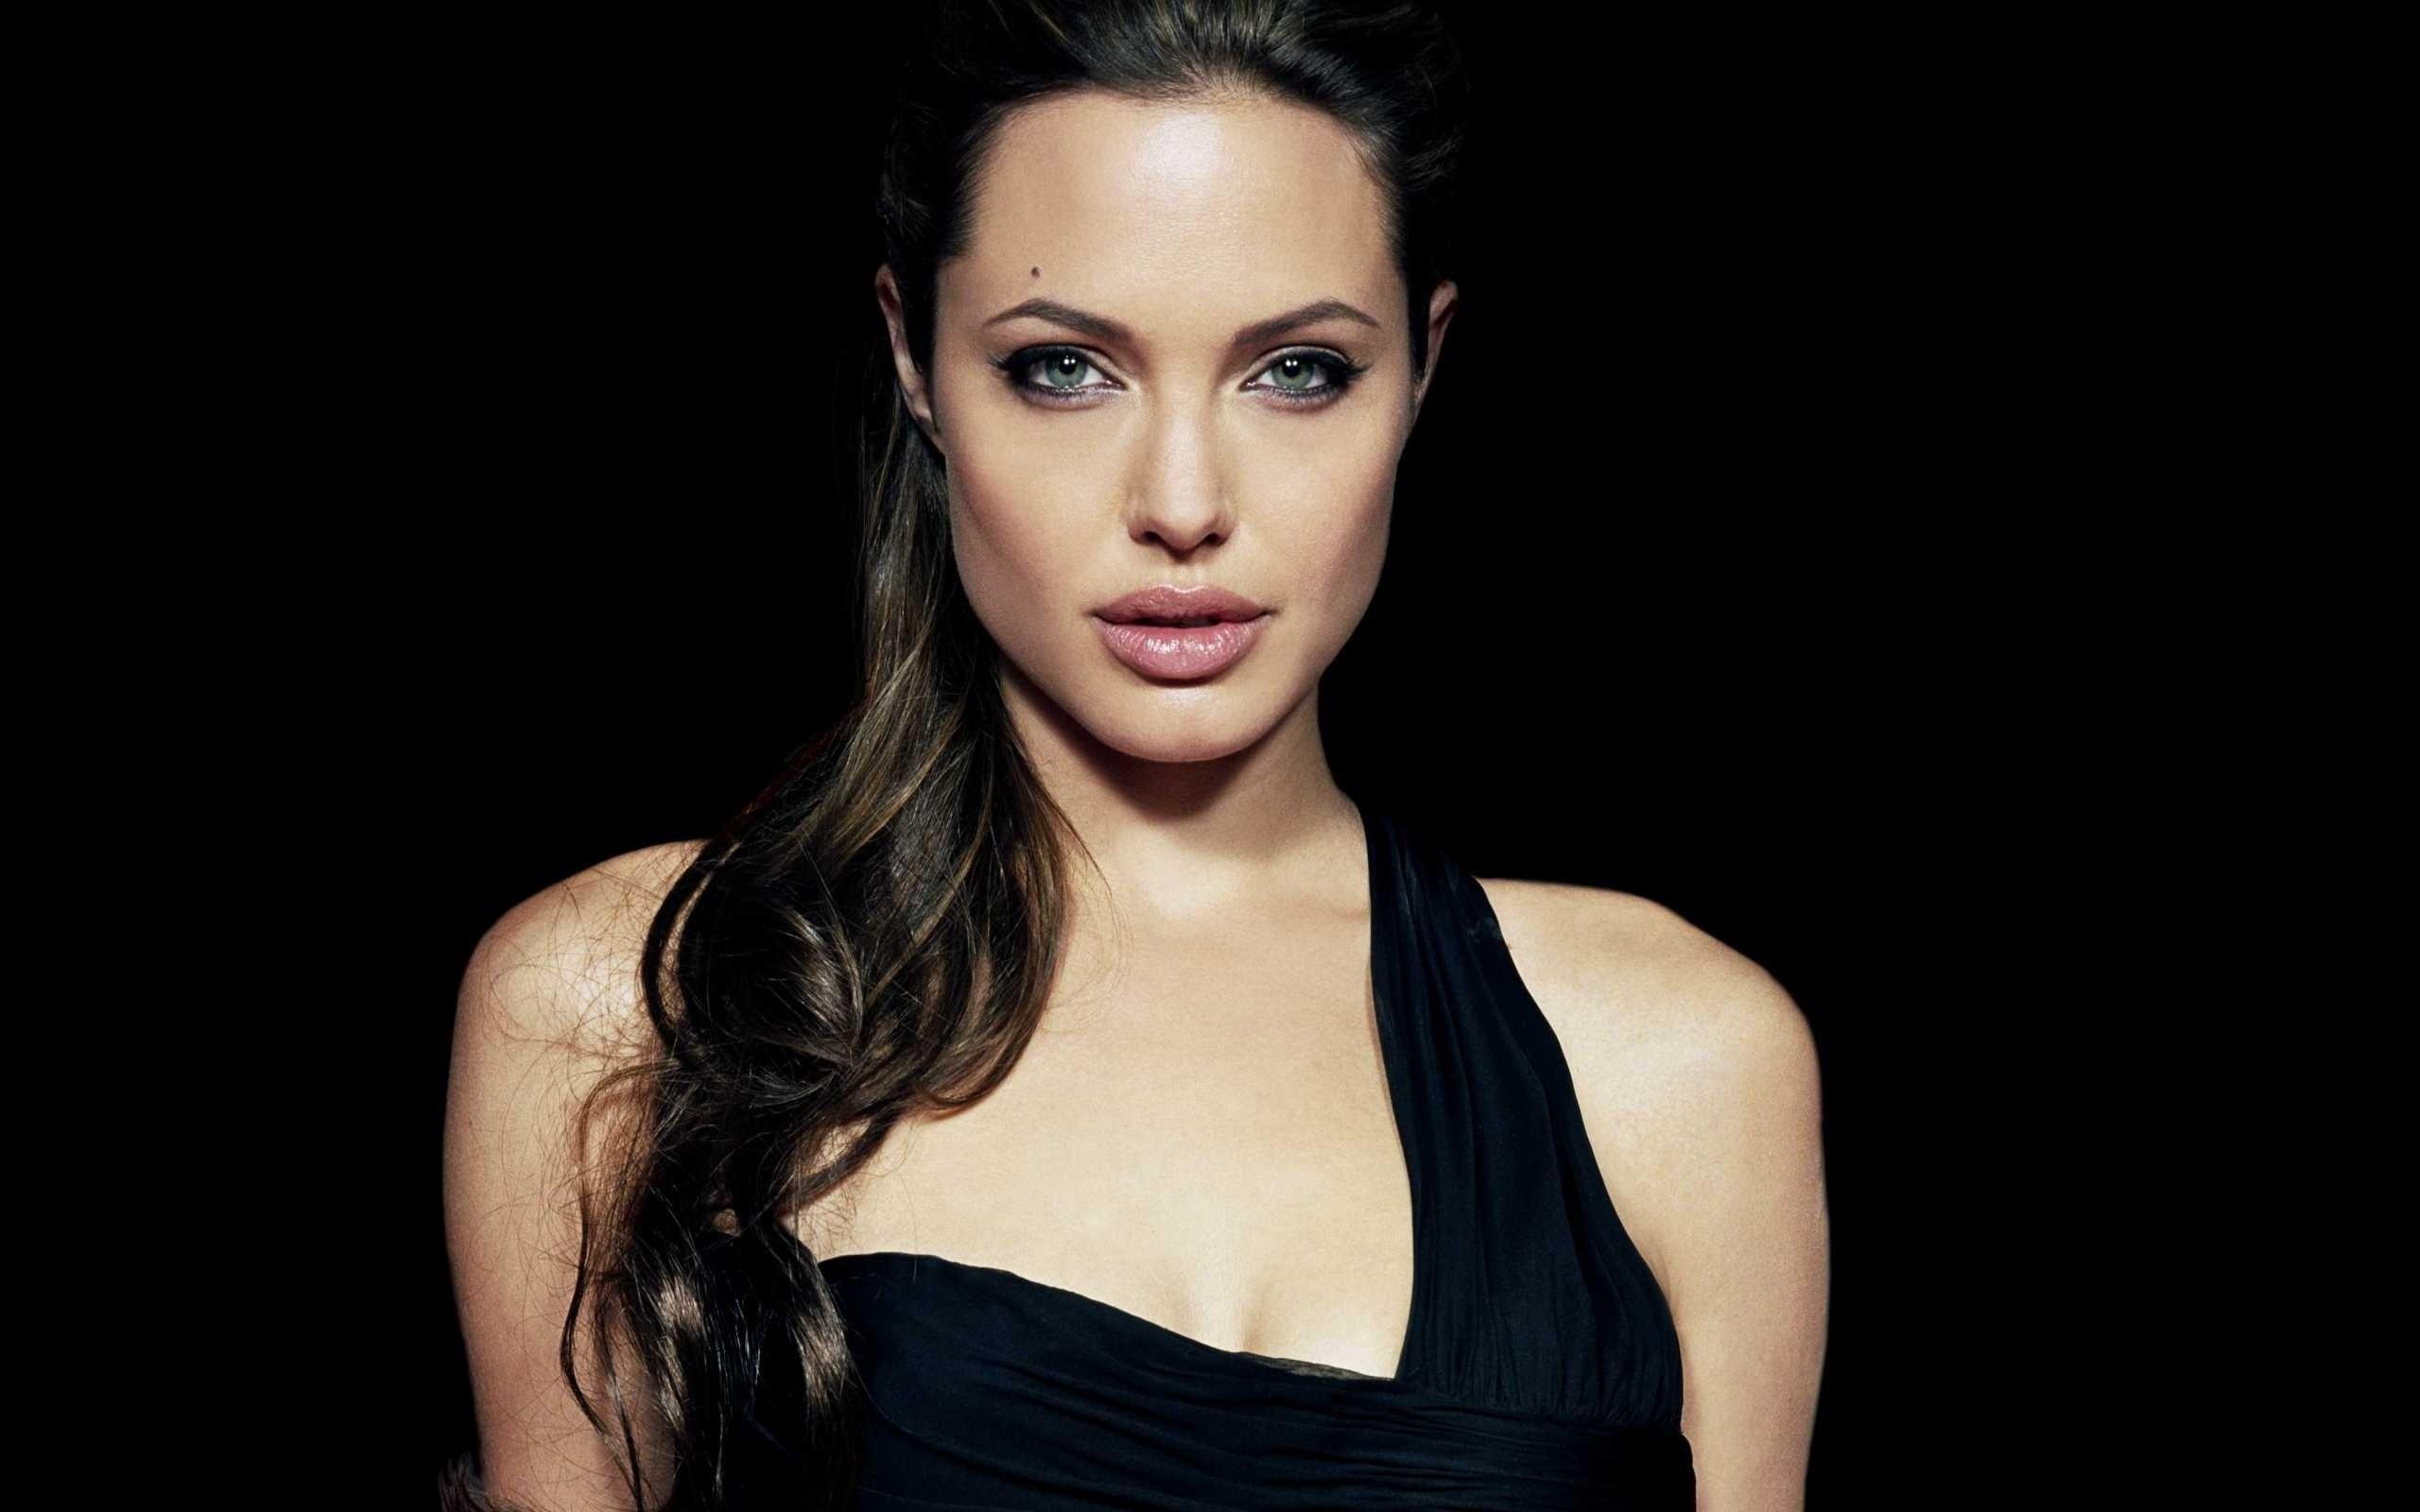 Angelina Jolie: Angelina Jolie, Women